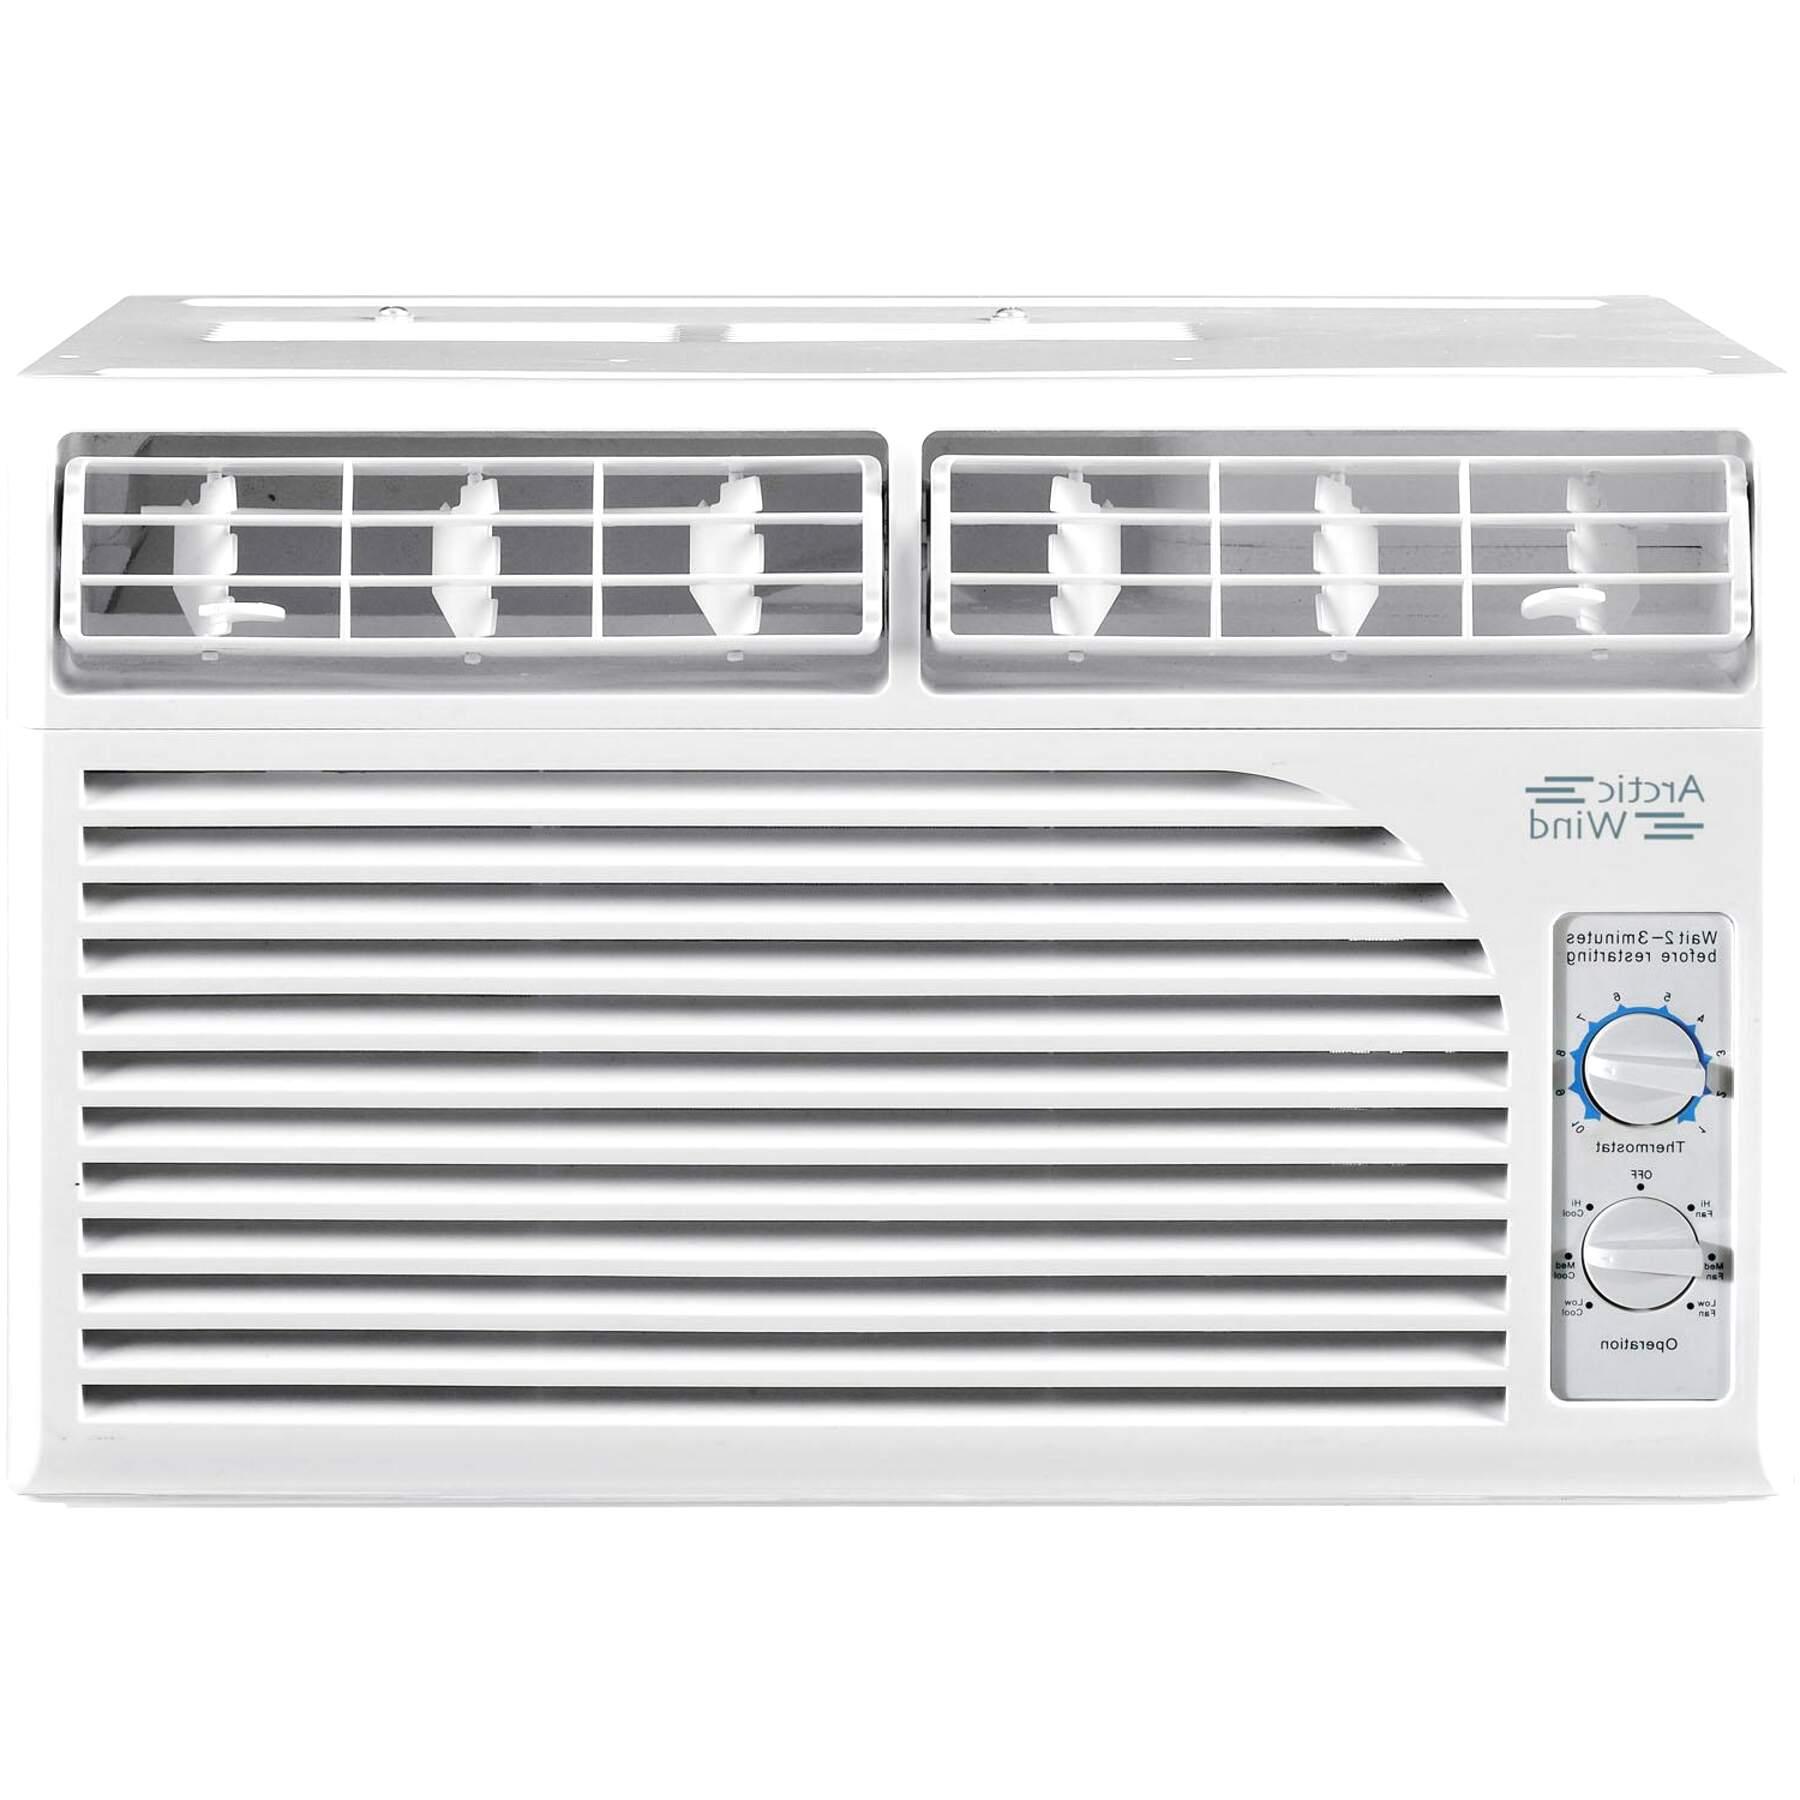 5000 btu air conditioner for sale